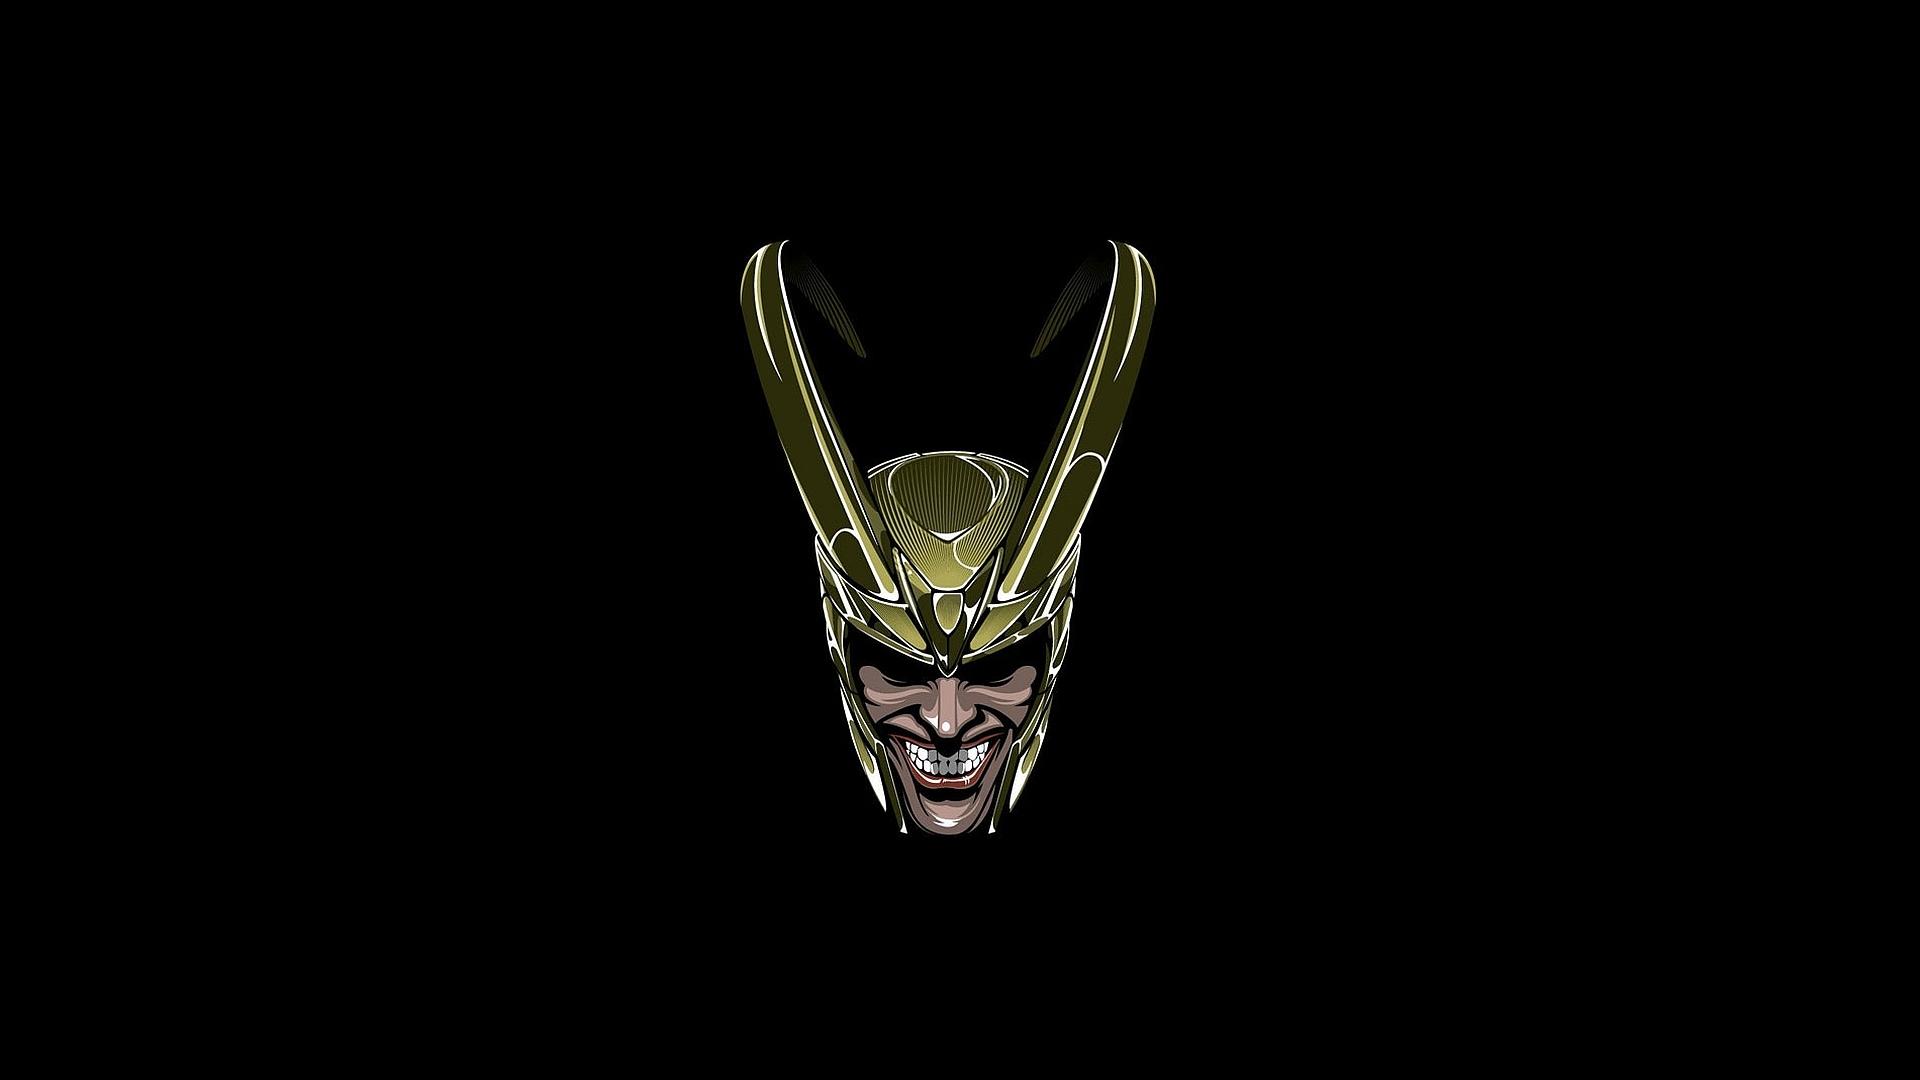 Download 40 Loki Wallpaper Hd for Desktop 1920x1080